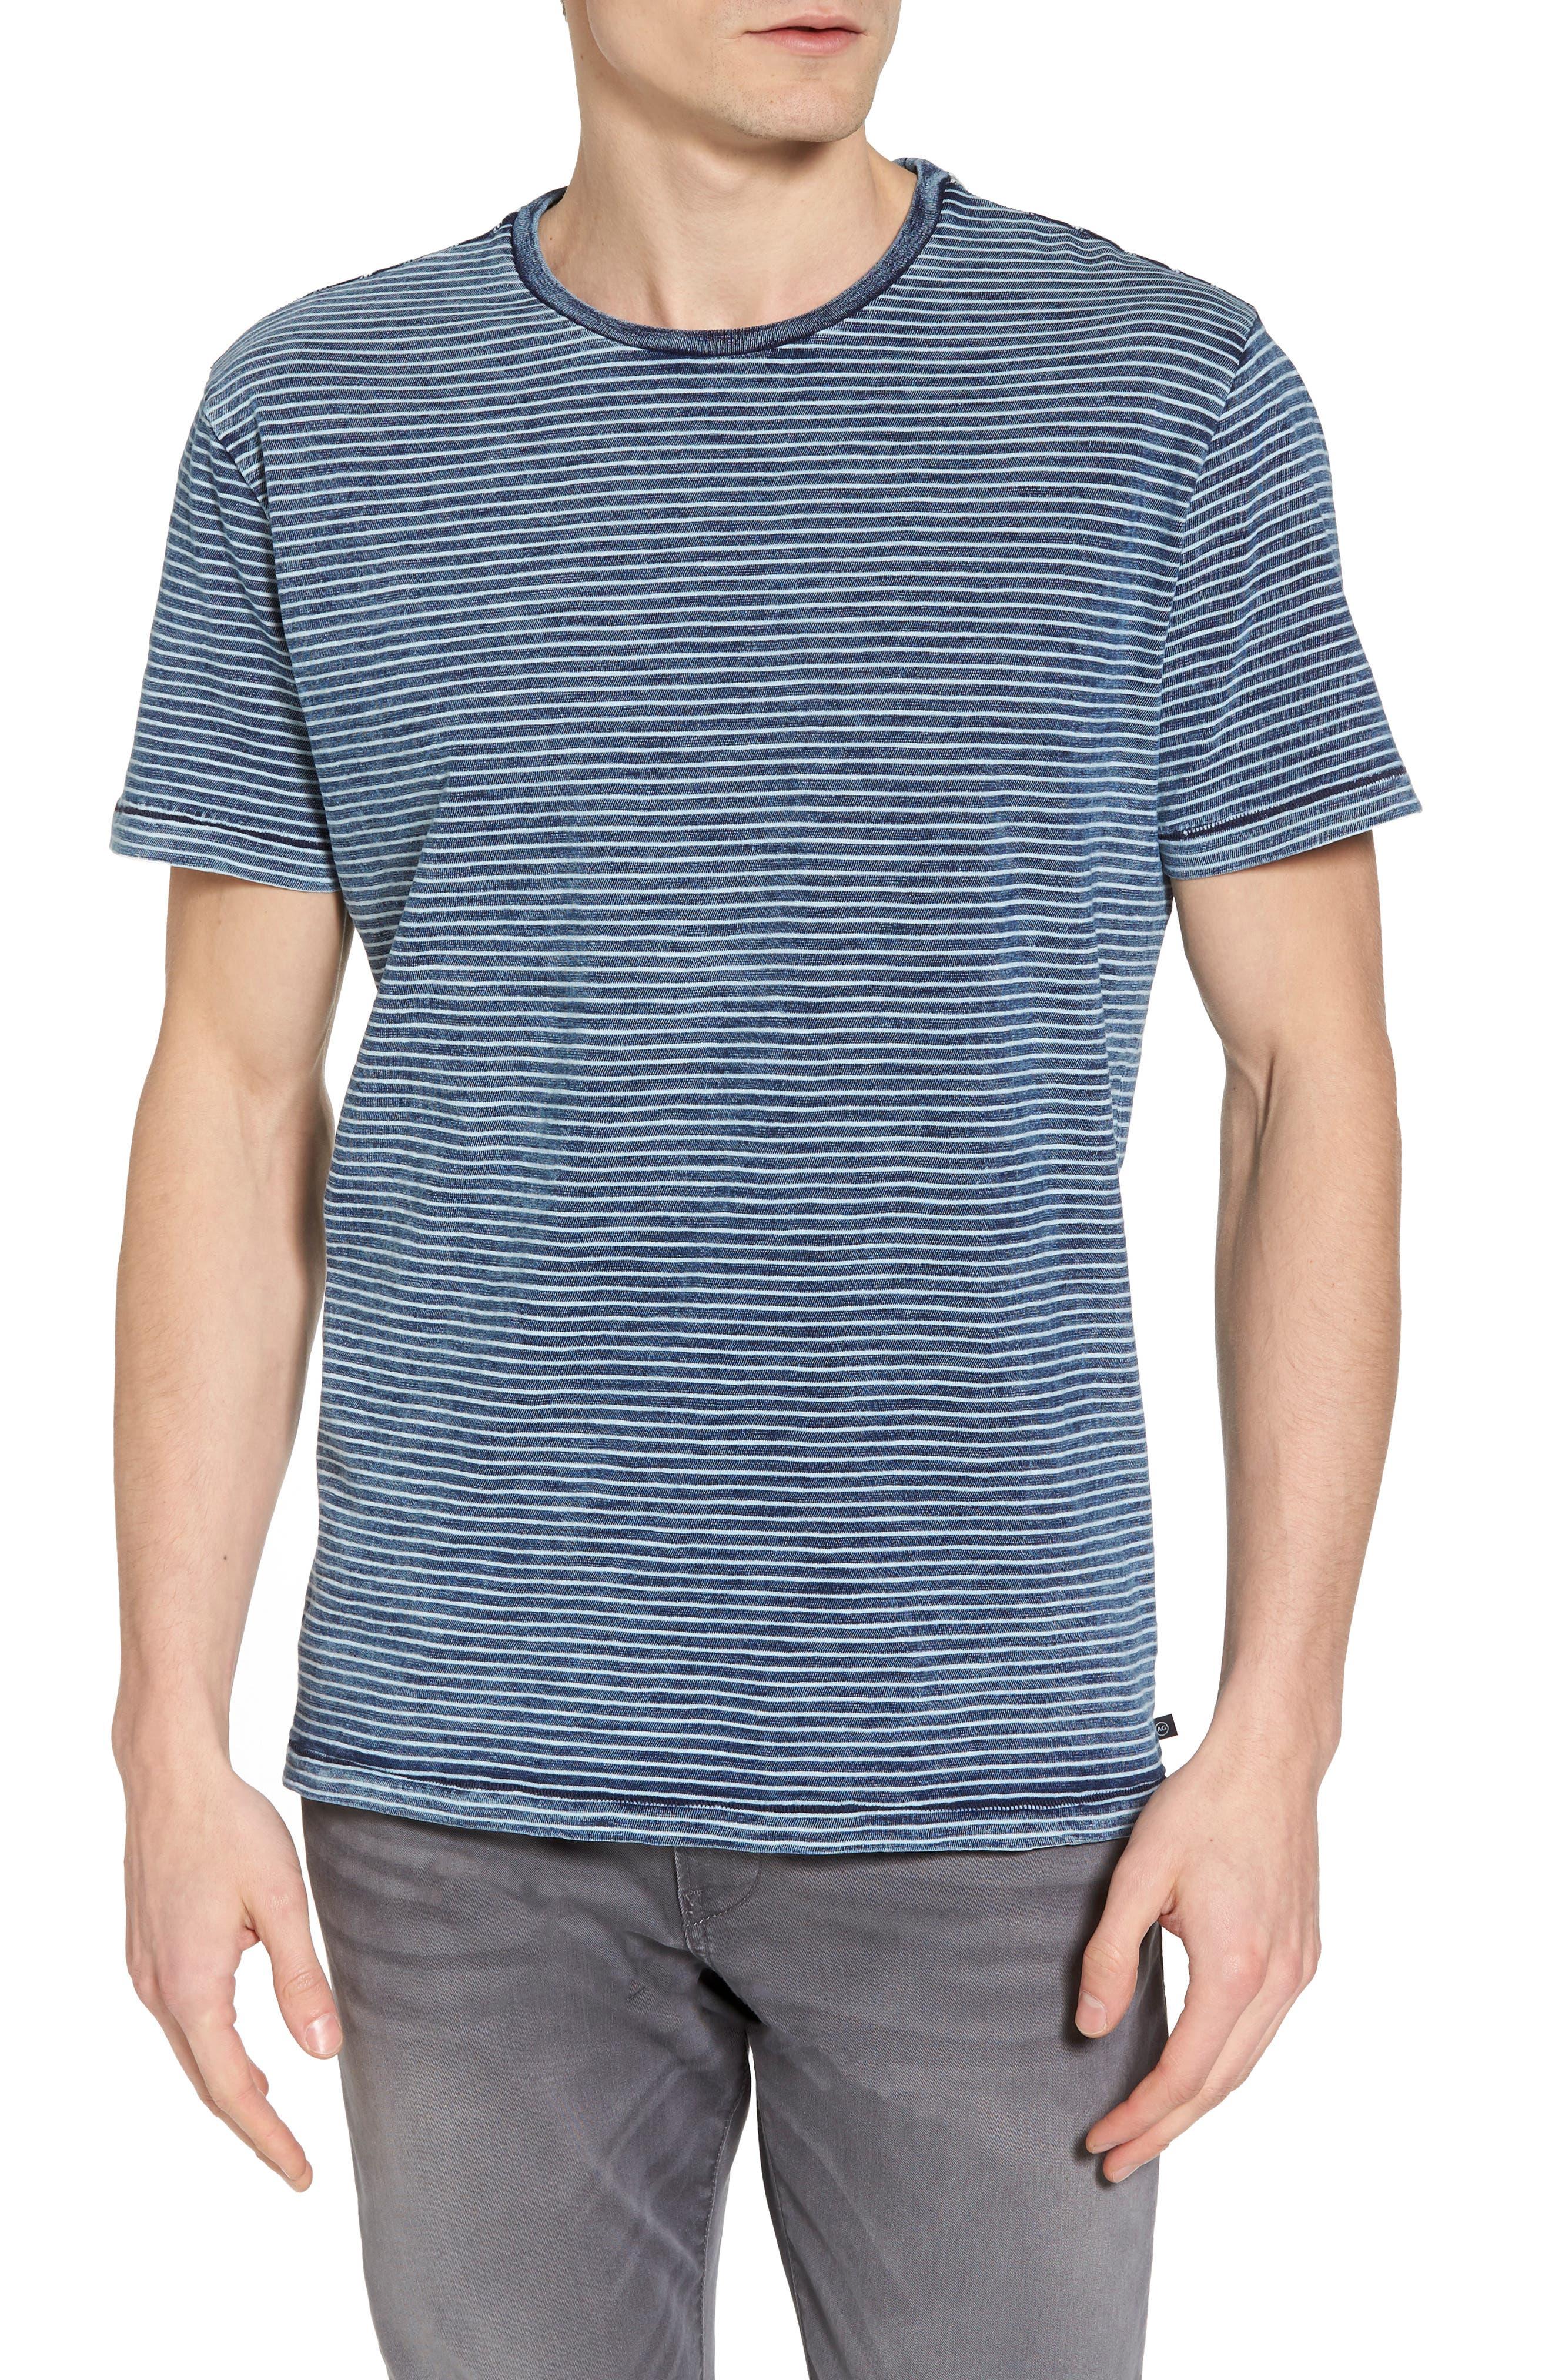 Julian Slim Fit Crewneck Shirt,                             Main thumbnail 3, color,